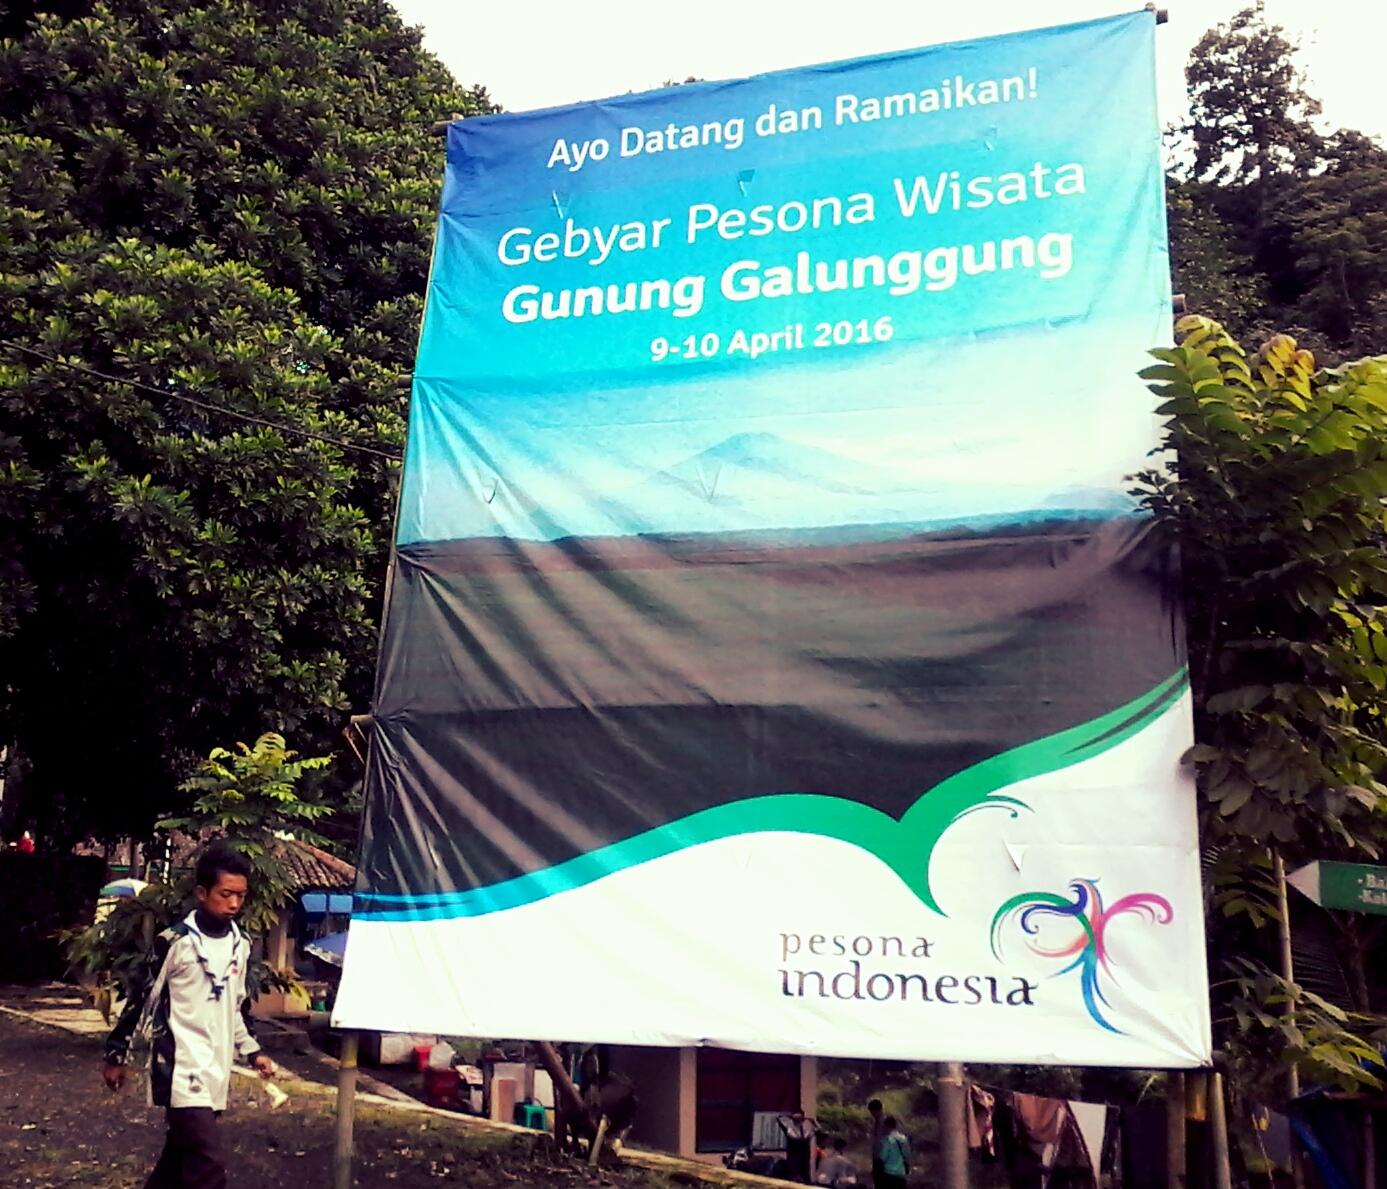 Travelplusindonesia Istiqosah Buka Festival Gebyar Pesona Wisata Gelang Event Konser Running Air Gunung Galunggung 2016 Berlangsung Hingga Minggu 10 4 Besok Acara Diisi Dengan Serangkaian Antara Lain Gerak Jalan